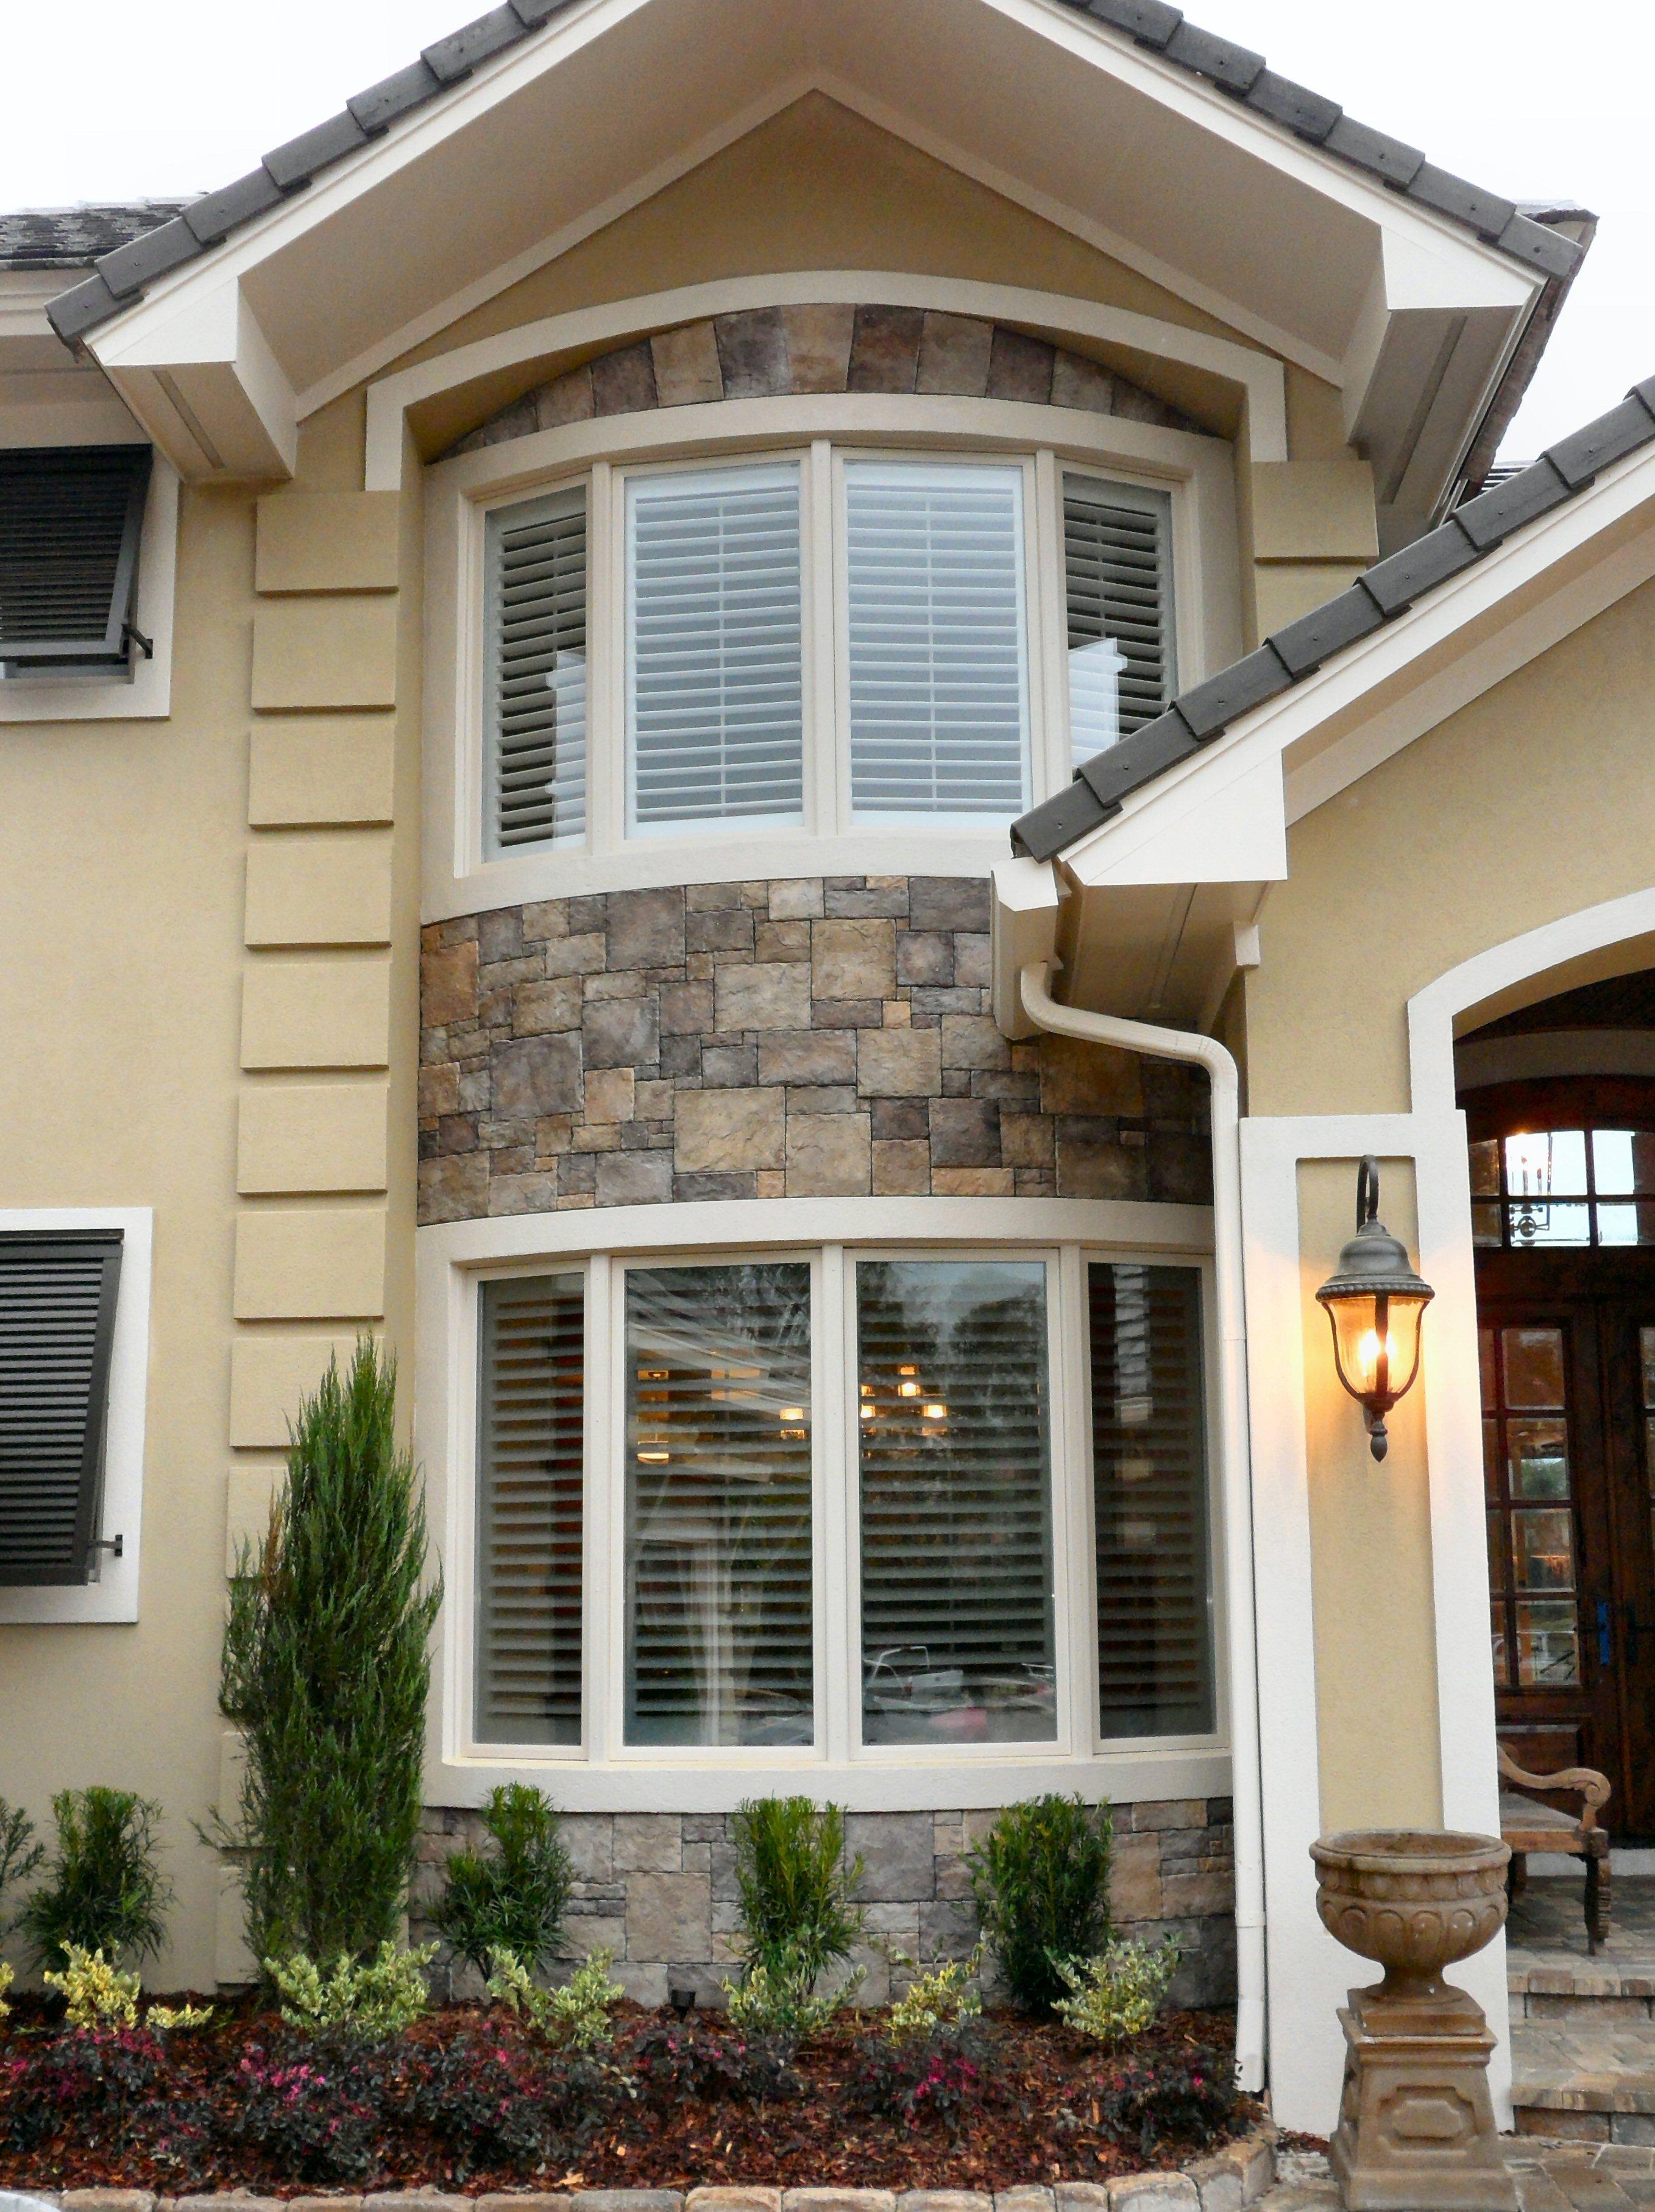 Stone exterior Beautiful Home Design